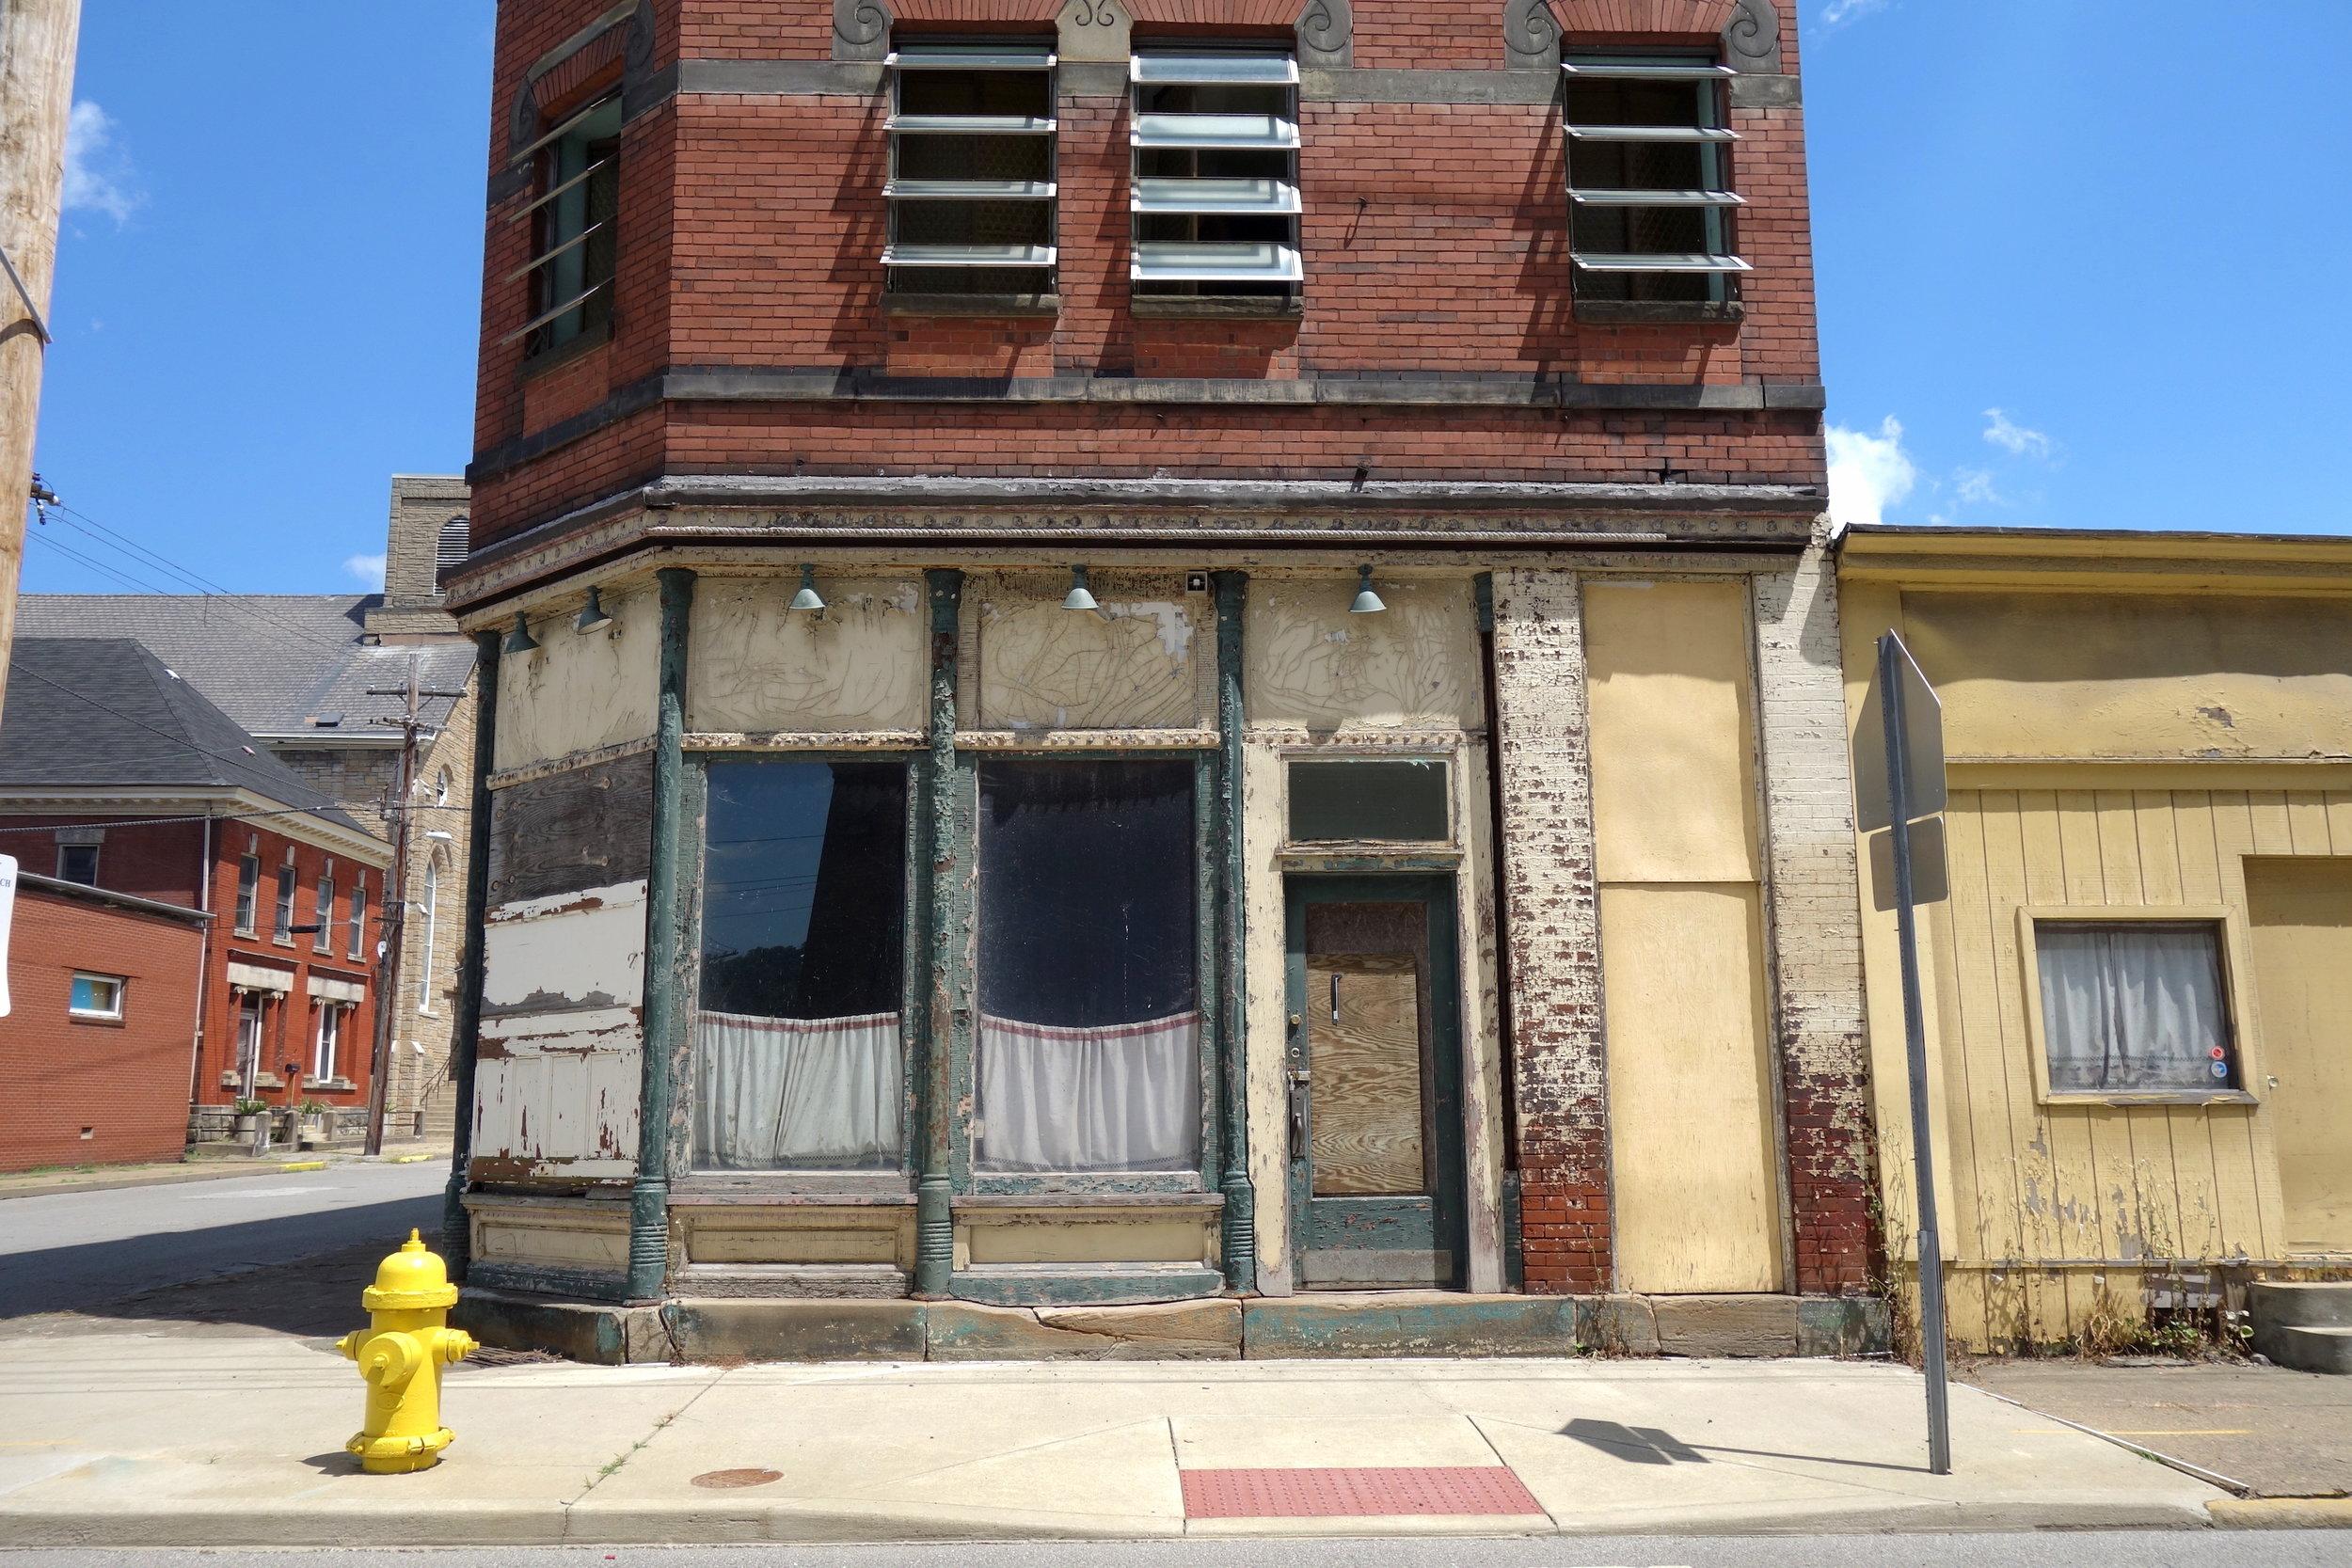 Figure 14. Vacant corner commercial building, Wheeling, 2016. Photograph by Joseph Heathcott.